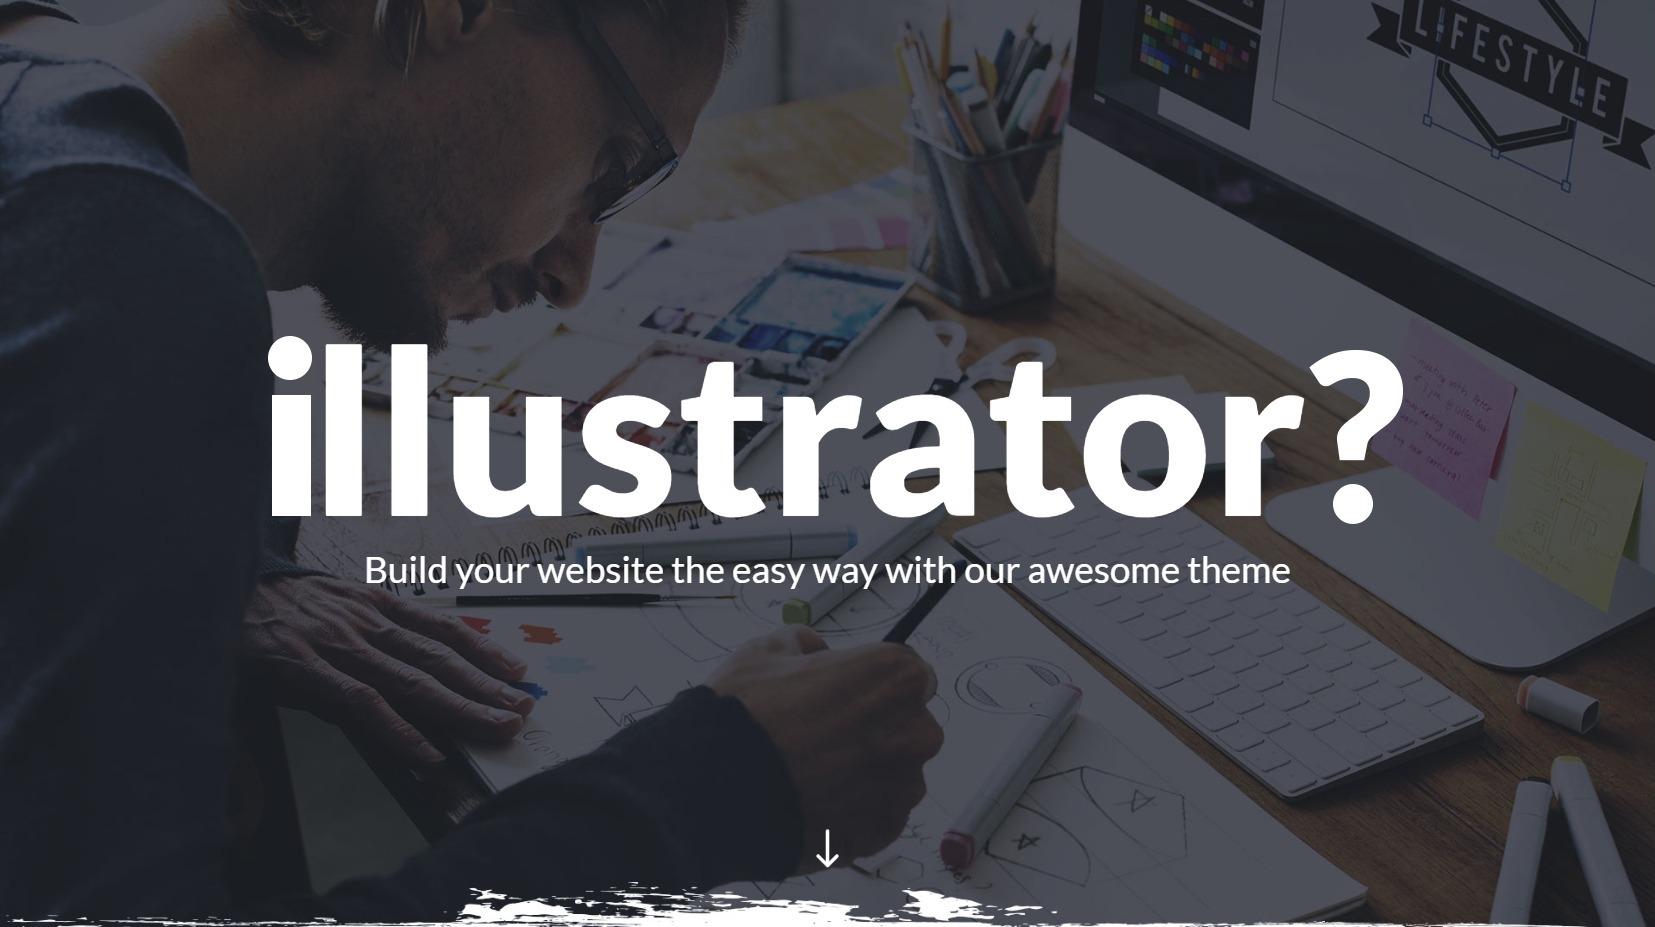 Illustrator WordPress Theme for Graphic Design and Illustrators